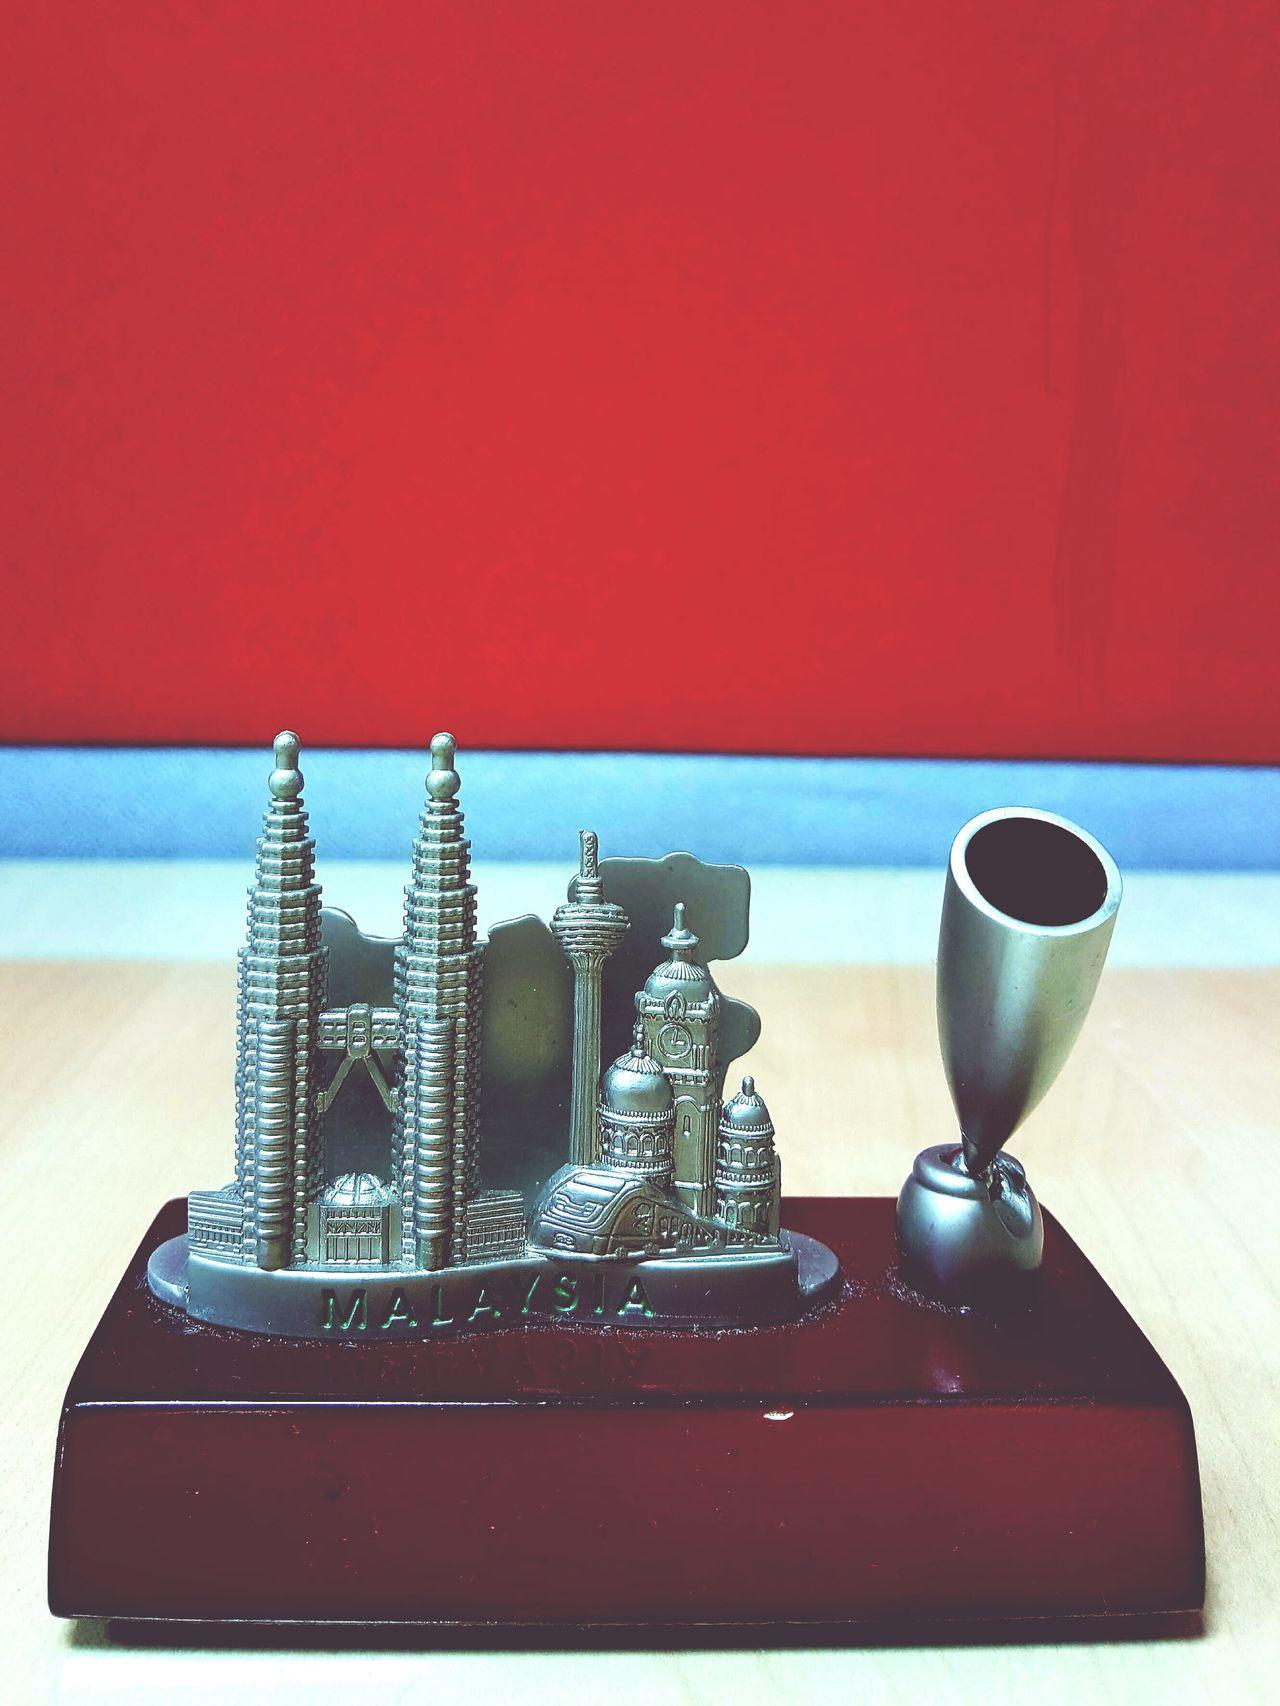 Pen Holder Desktop Card Holder KLCC Tower Menara Kuala Lumpur Indoor No People Lieblingsteil